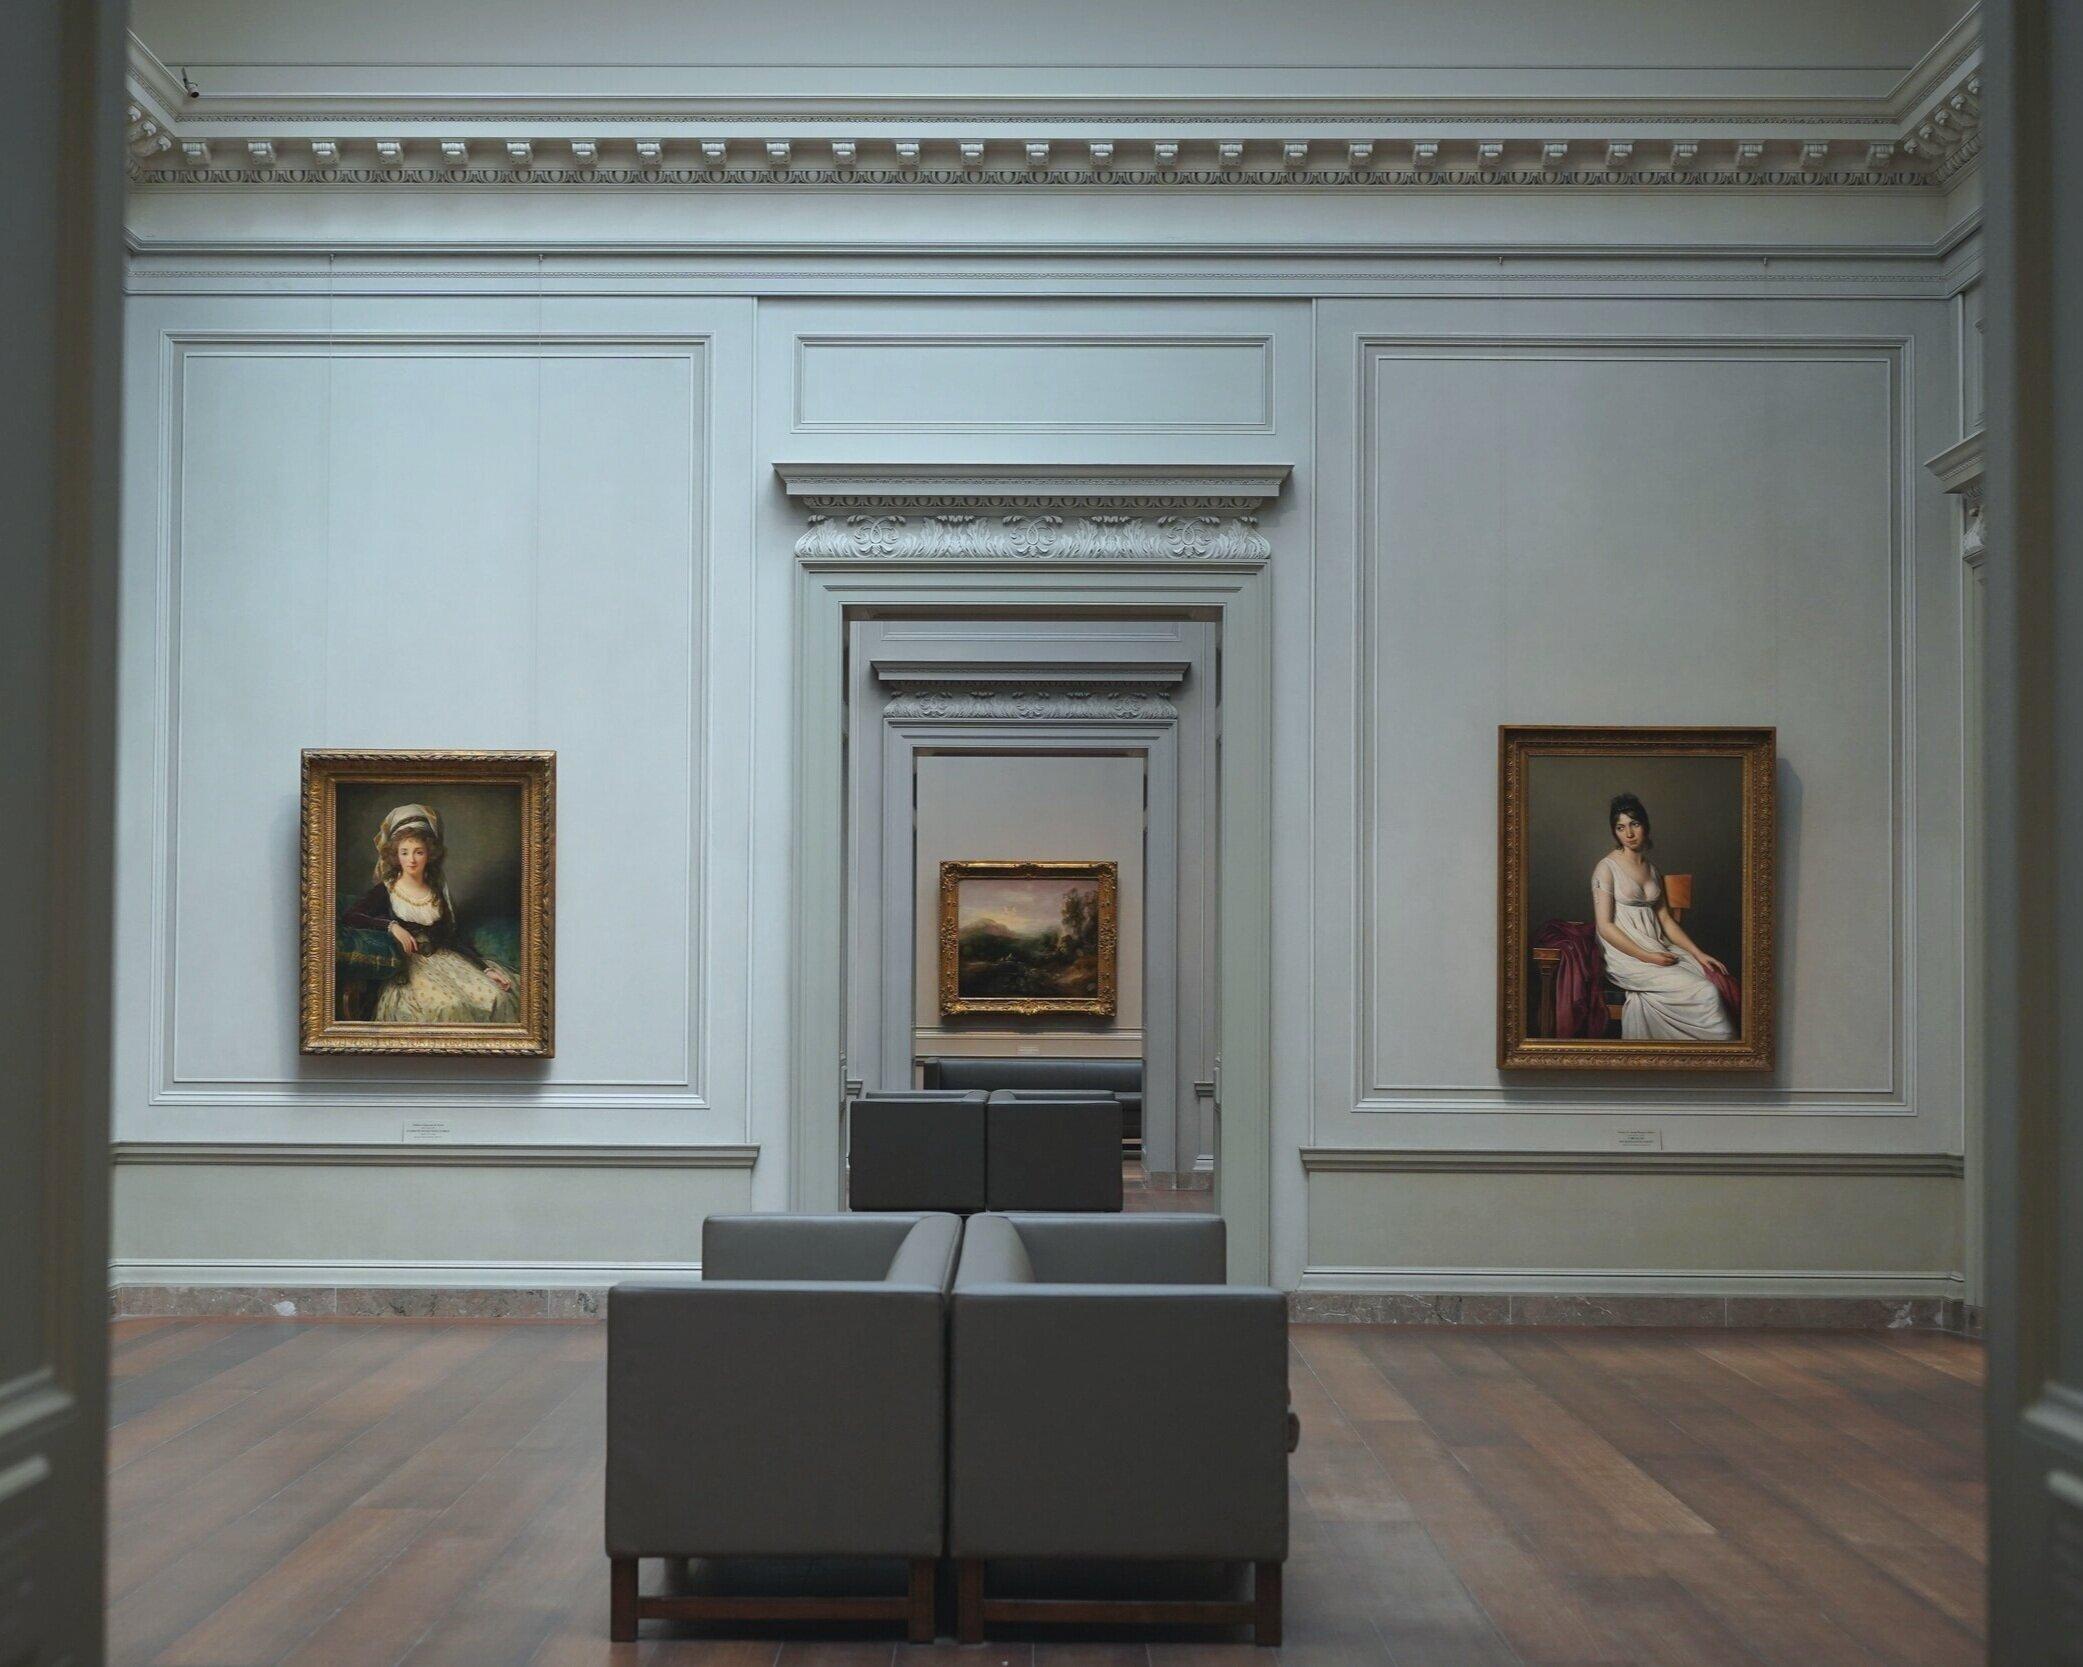 National Gallery of Art, Washington DC, USA